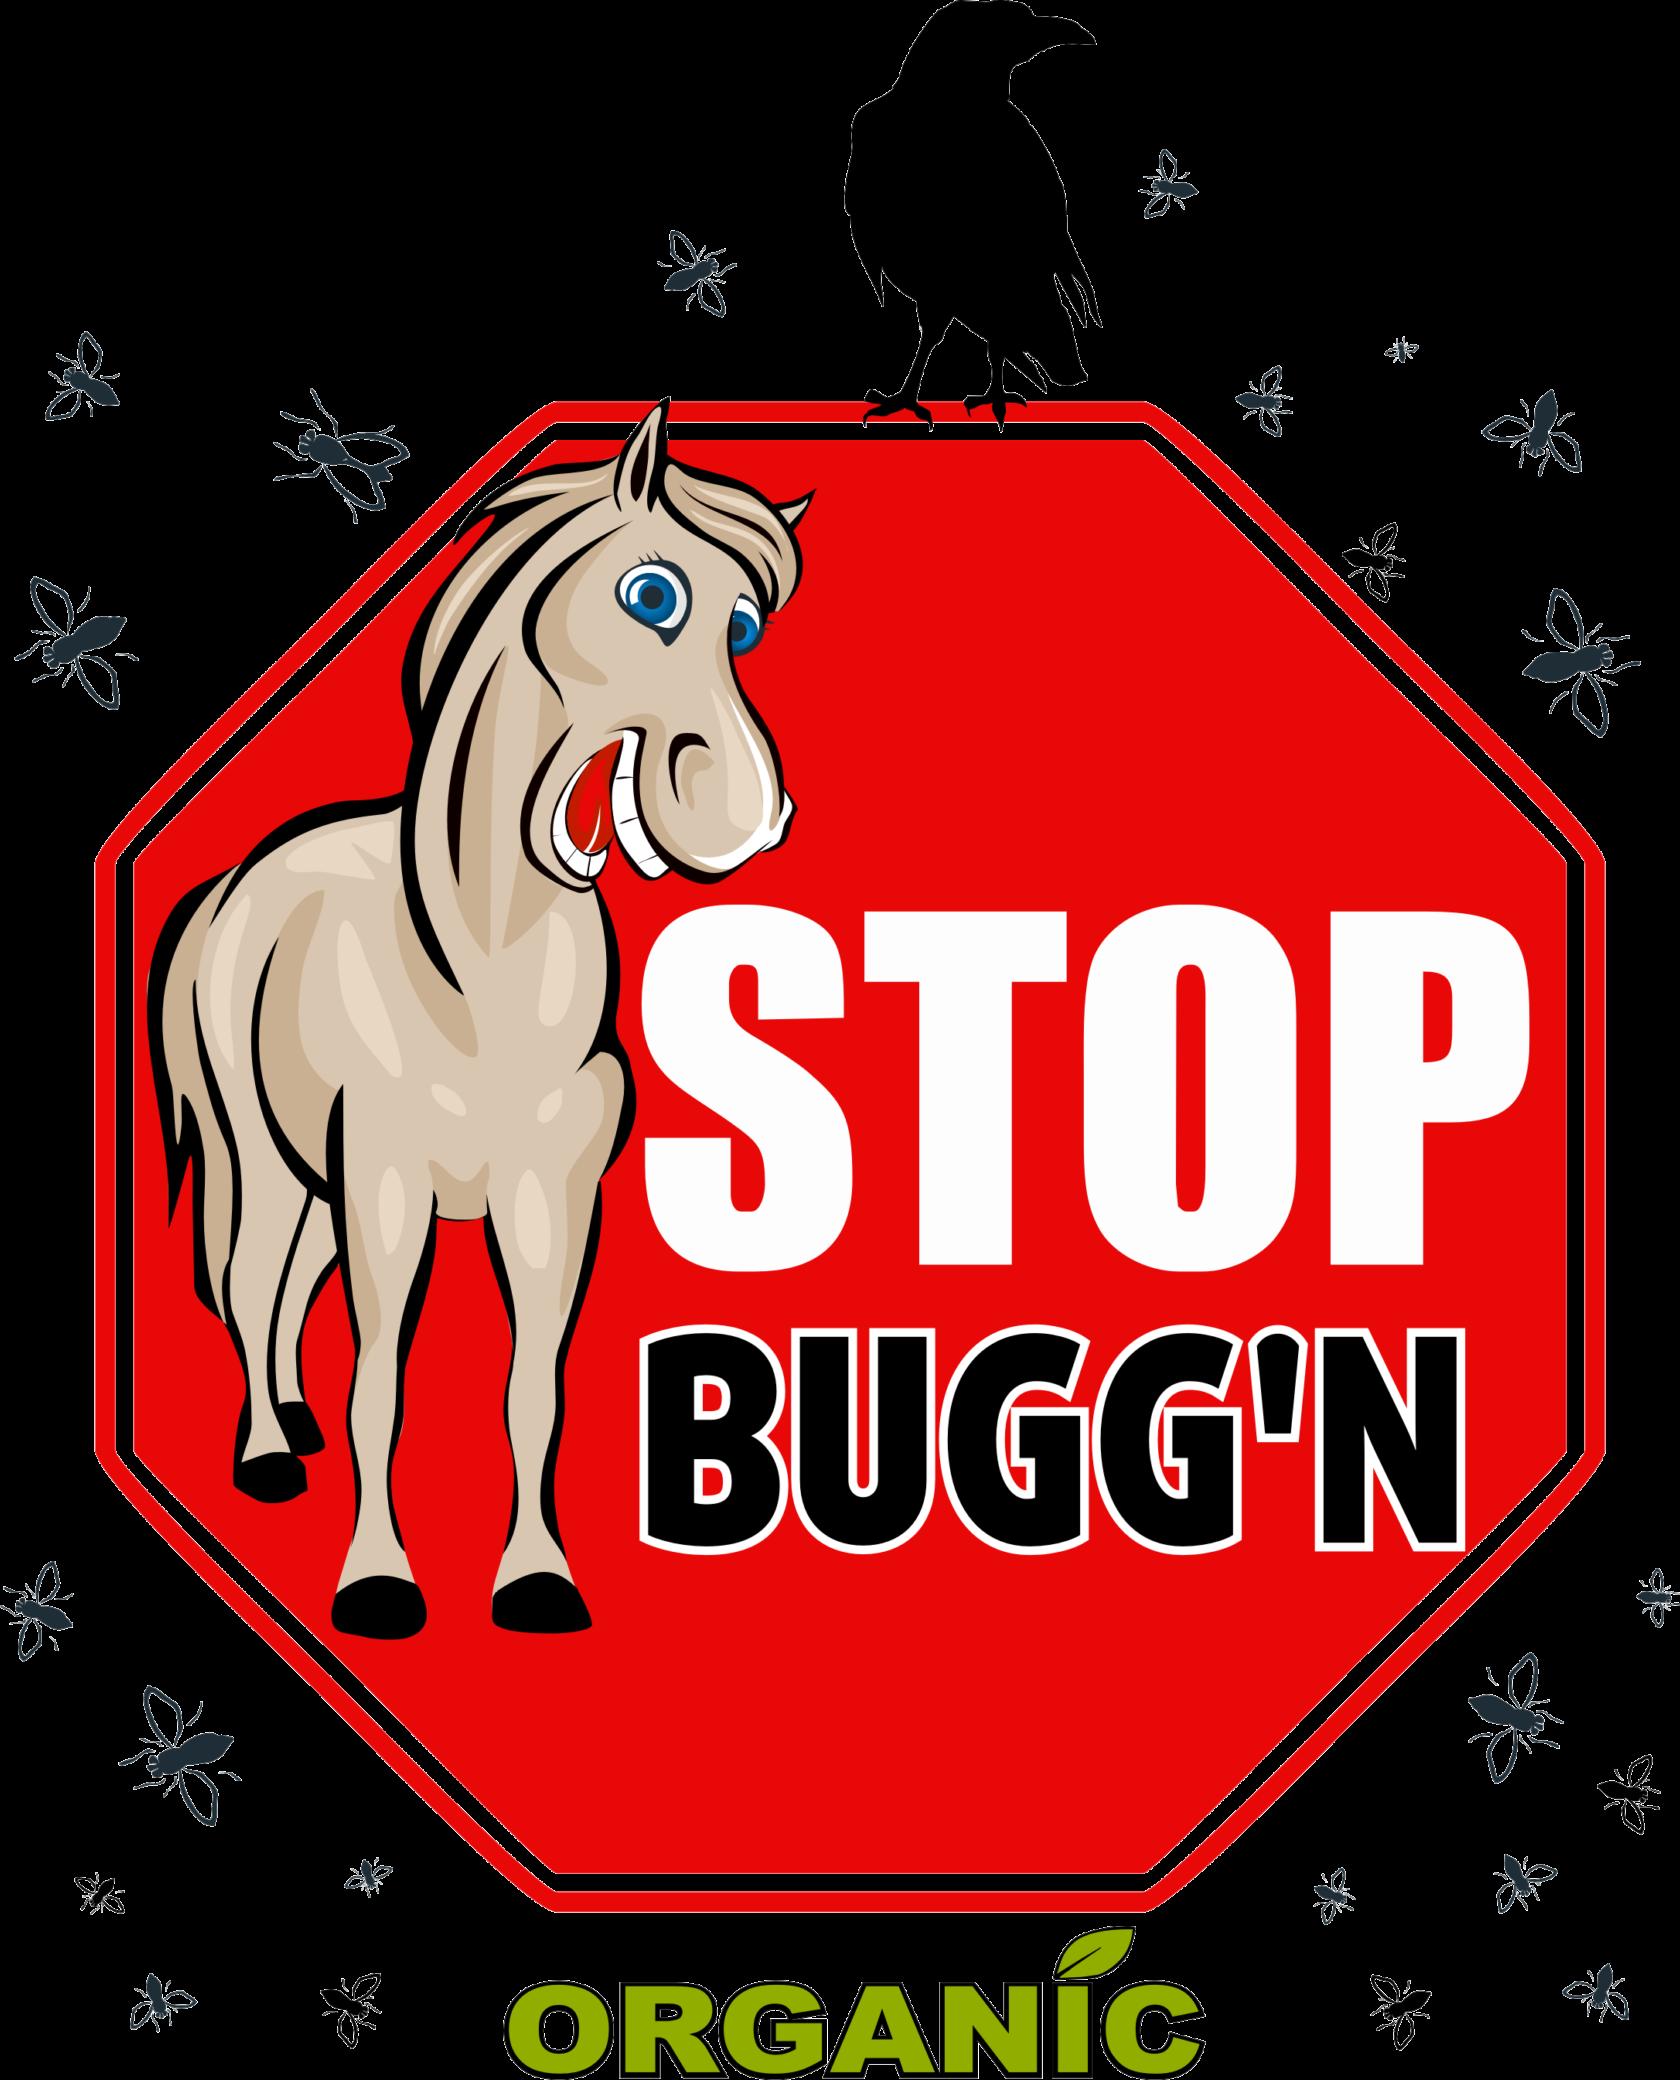 stop_buggn_logo_2173x2690